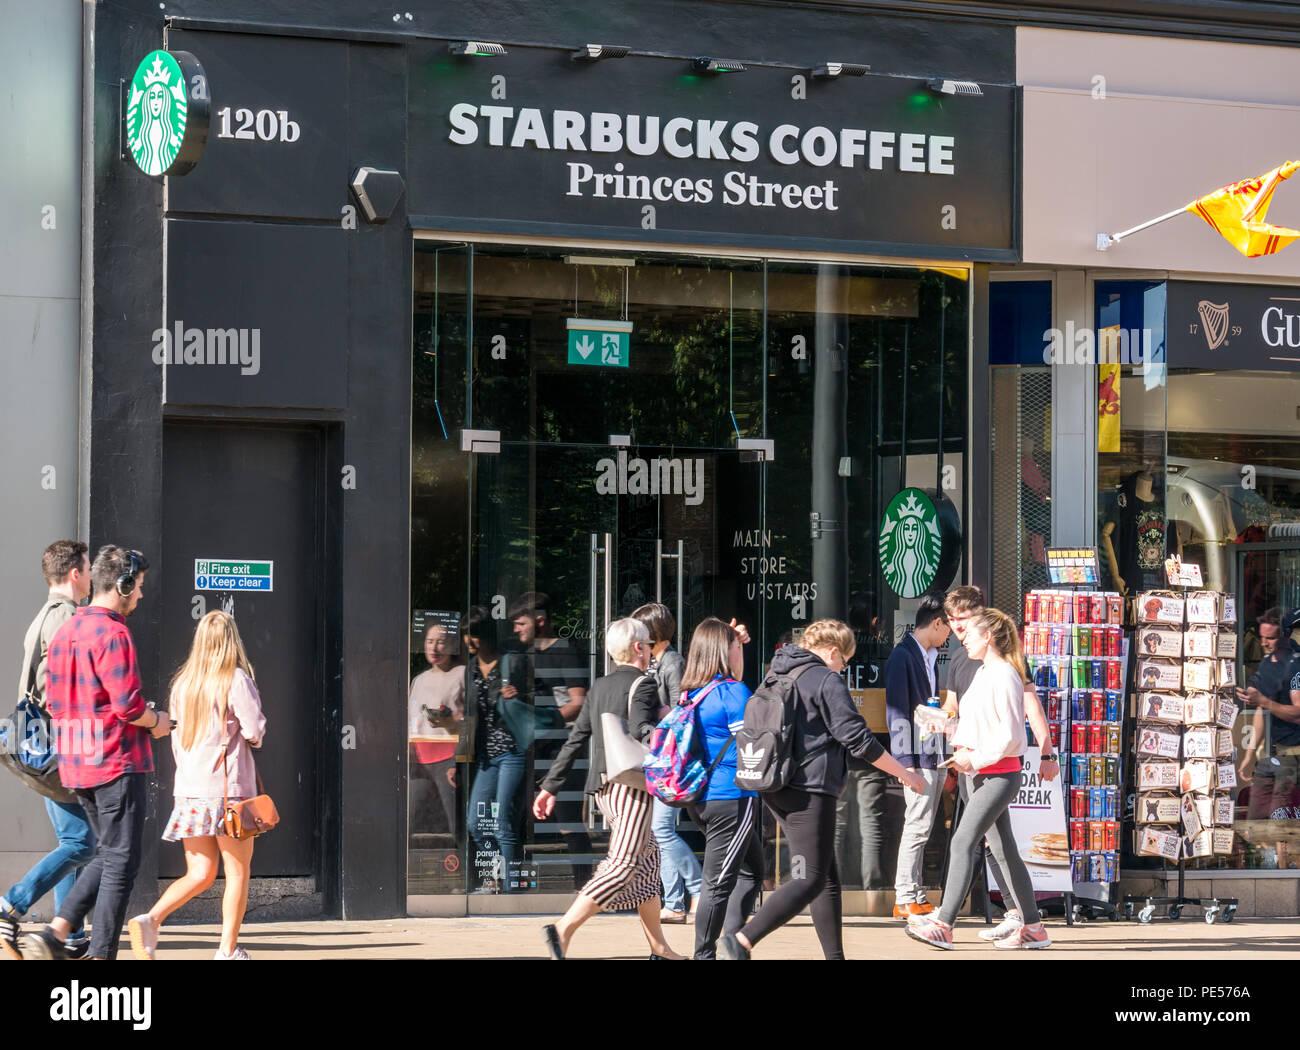 People Walking Past Frontage Of Starbucks Coffee Shop